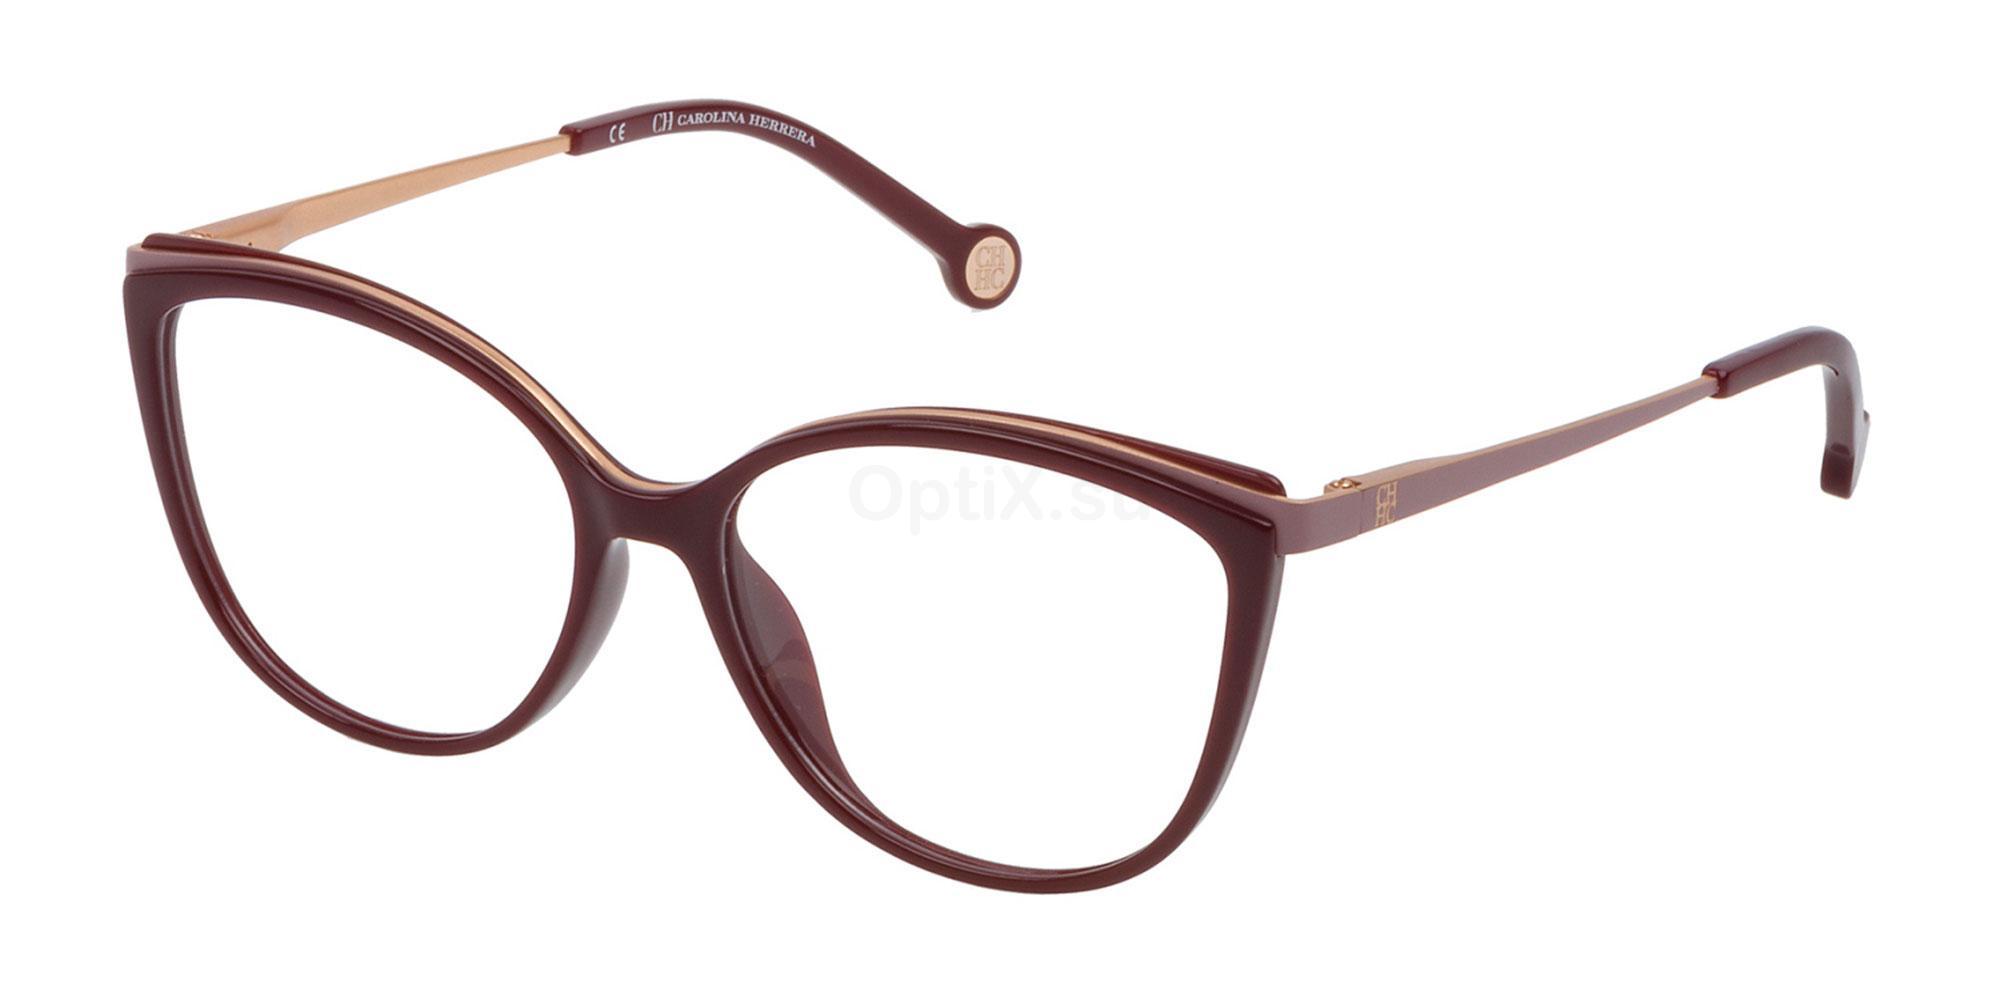 09FD VHE783 Glasses, CH Carolina Herrera